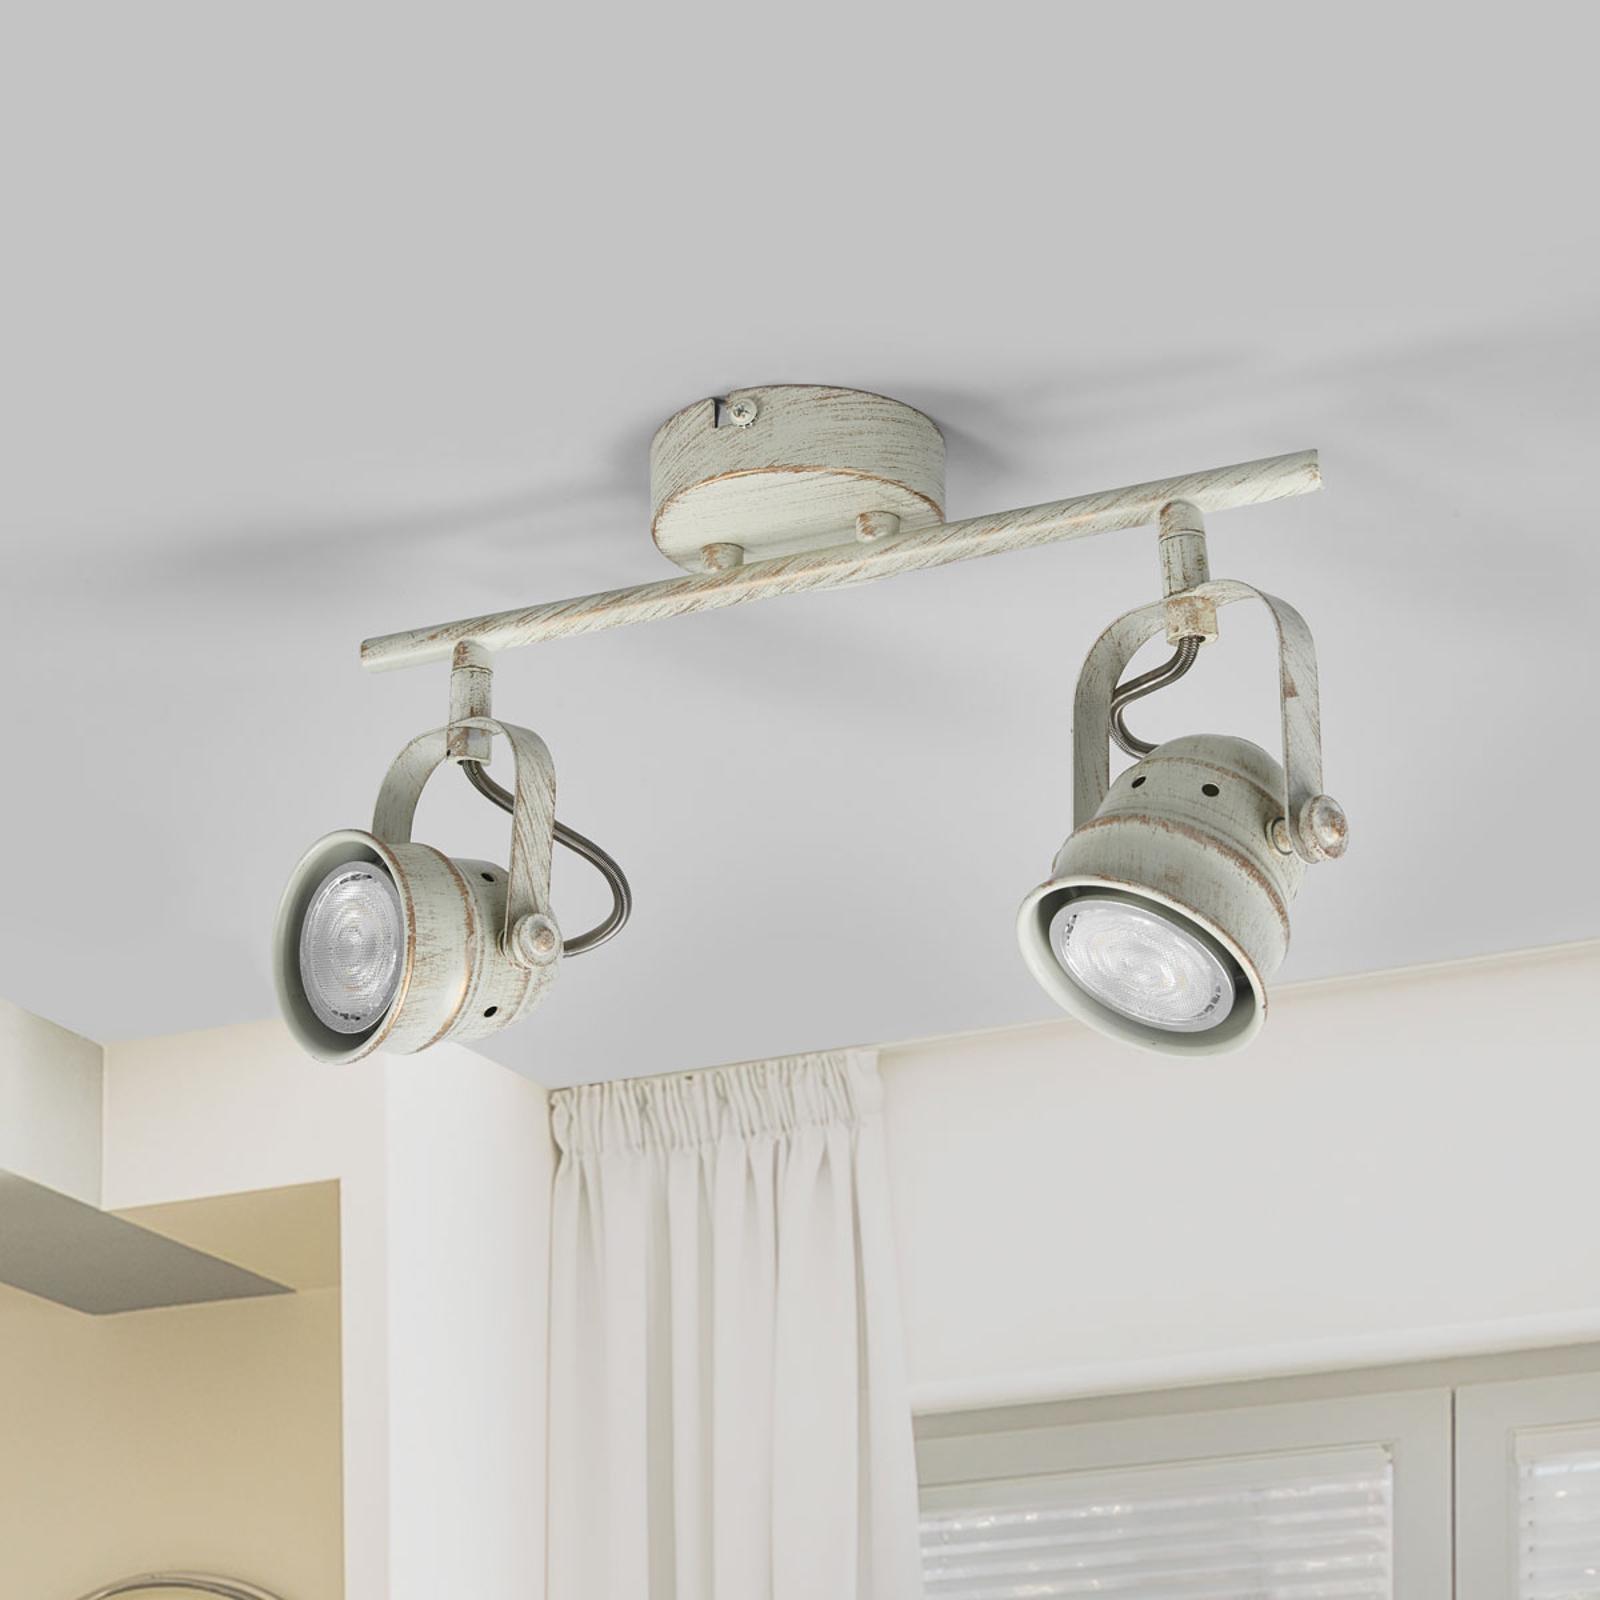 2-flammige LED-Deckenlampe Leonor in Weiß